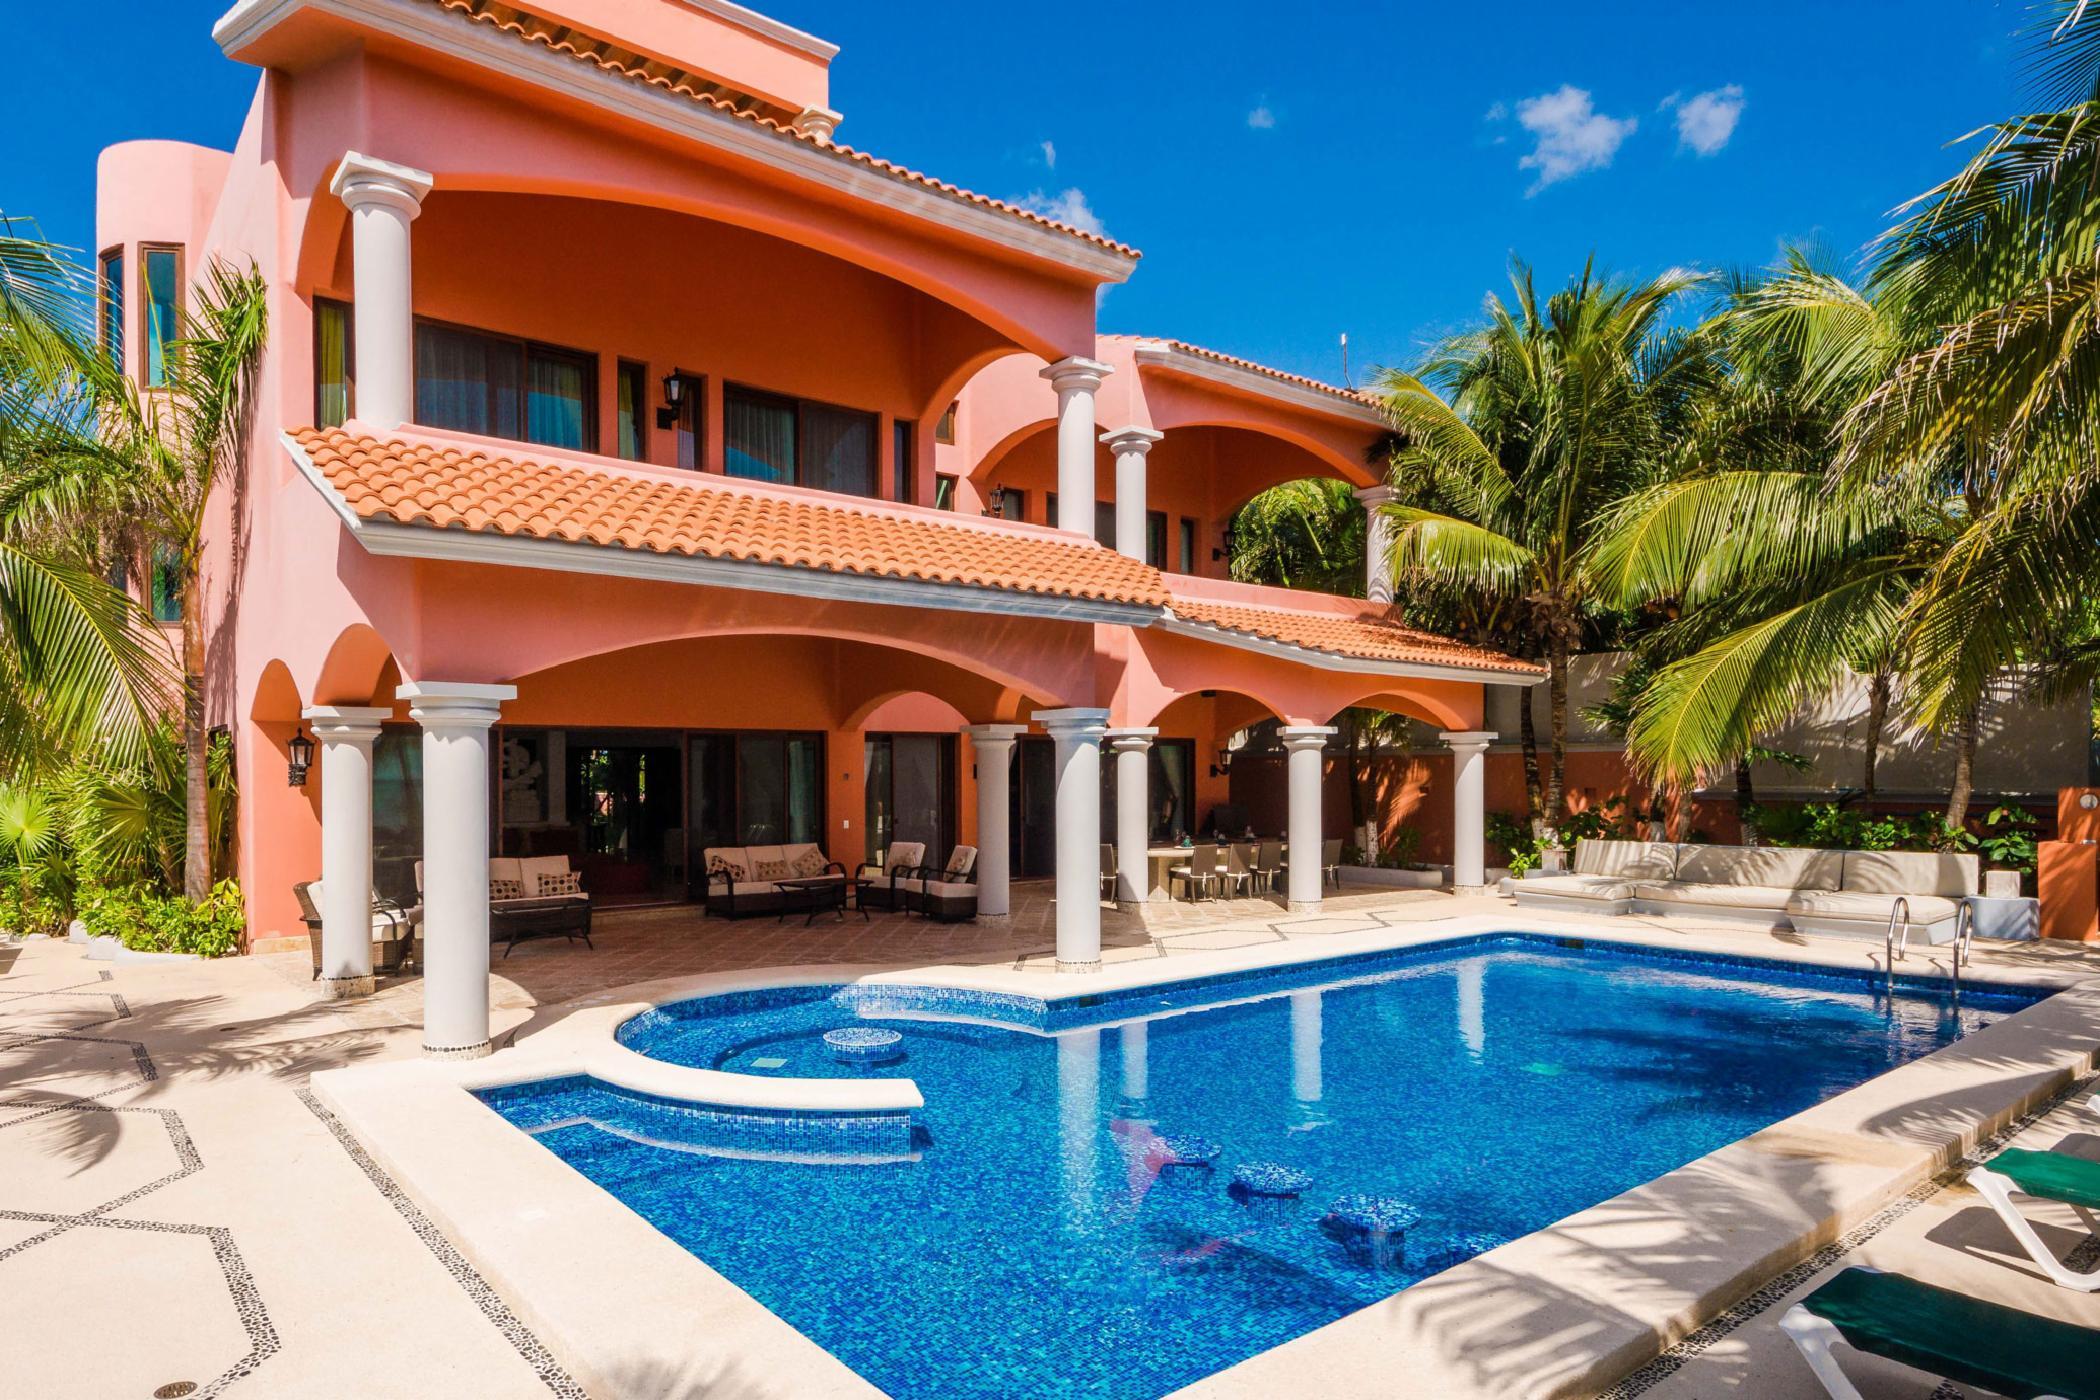 Exquisite Soliman Bay 10 BDR oceanfront villa; luxurious pool, beautiful verandas, private beach amenities